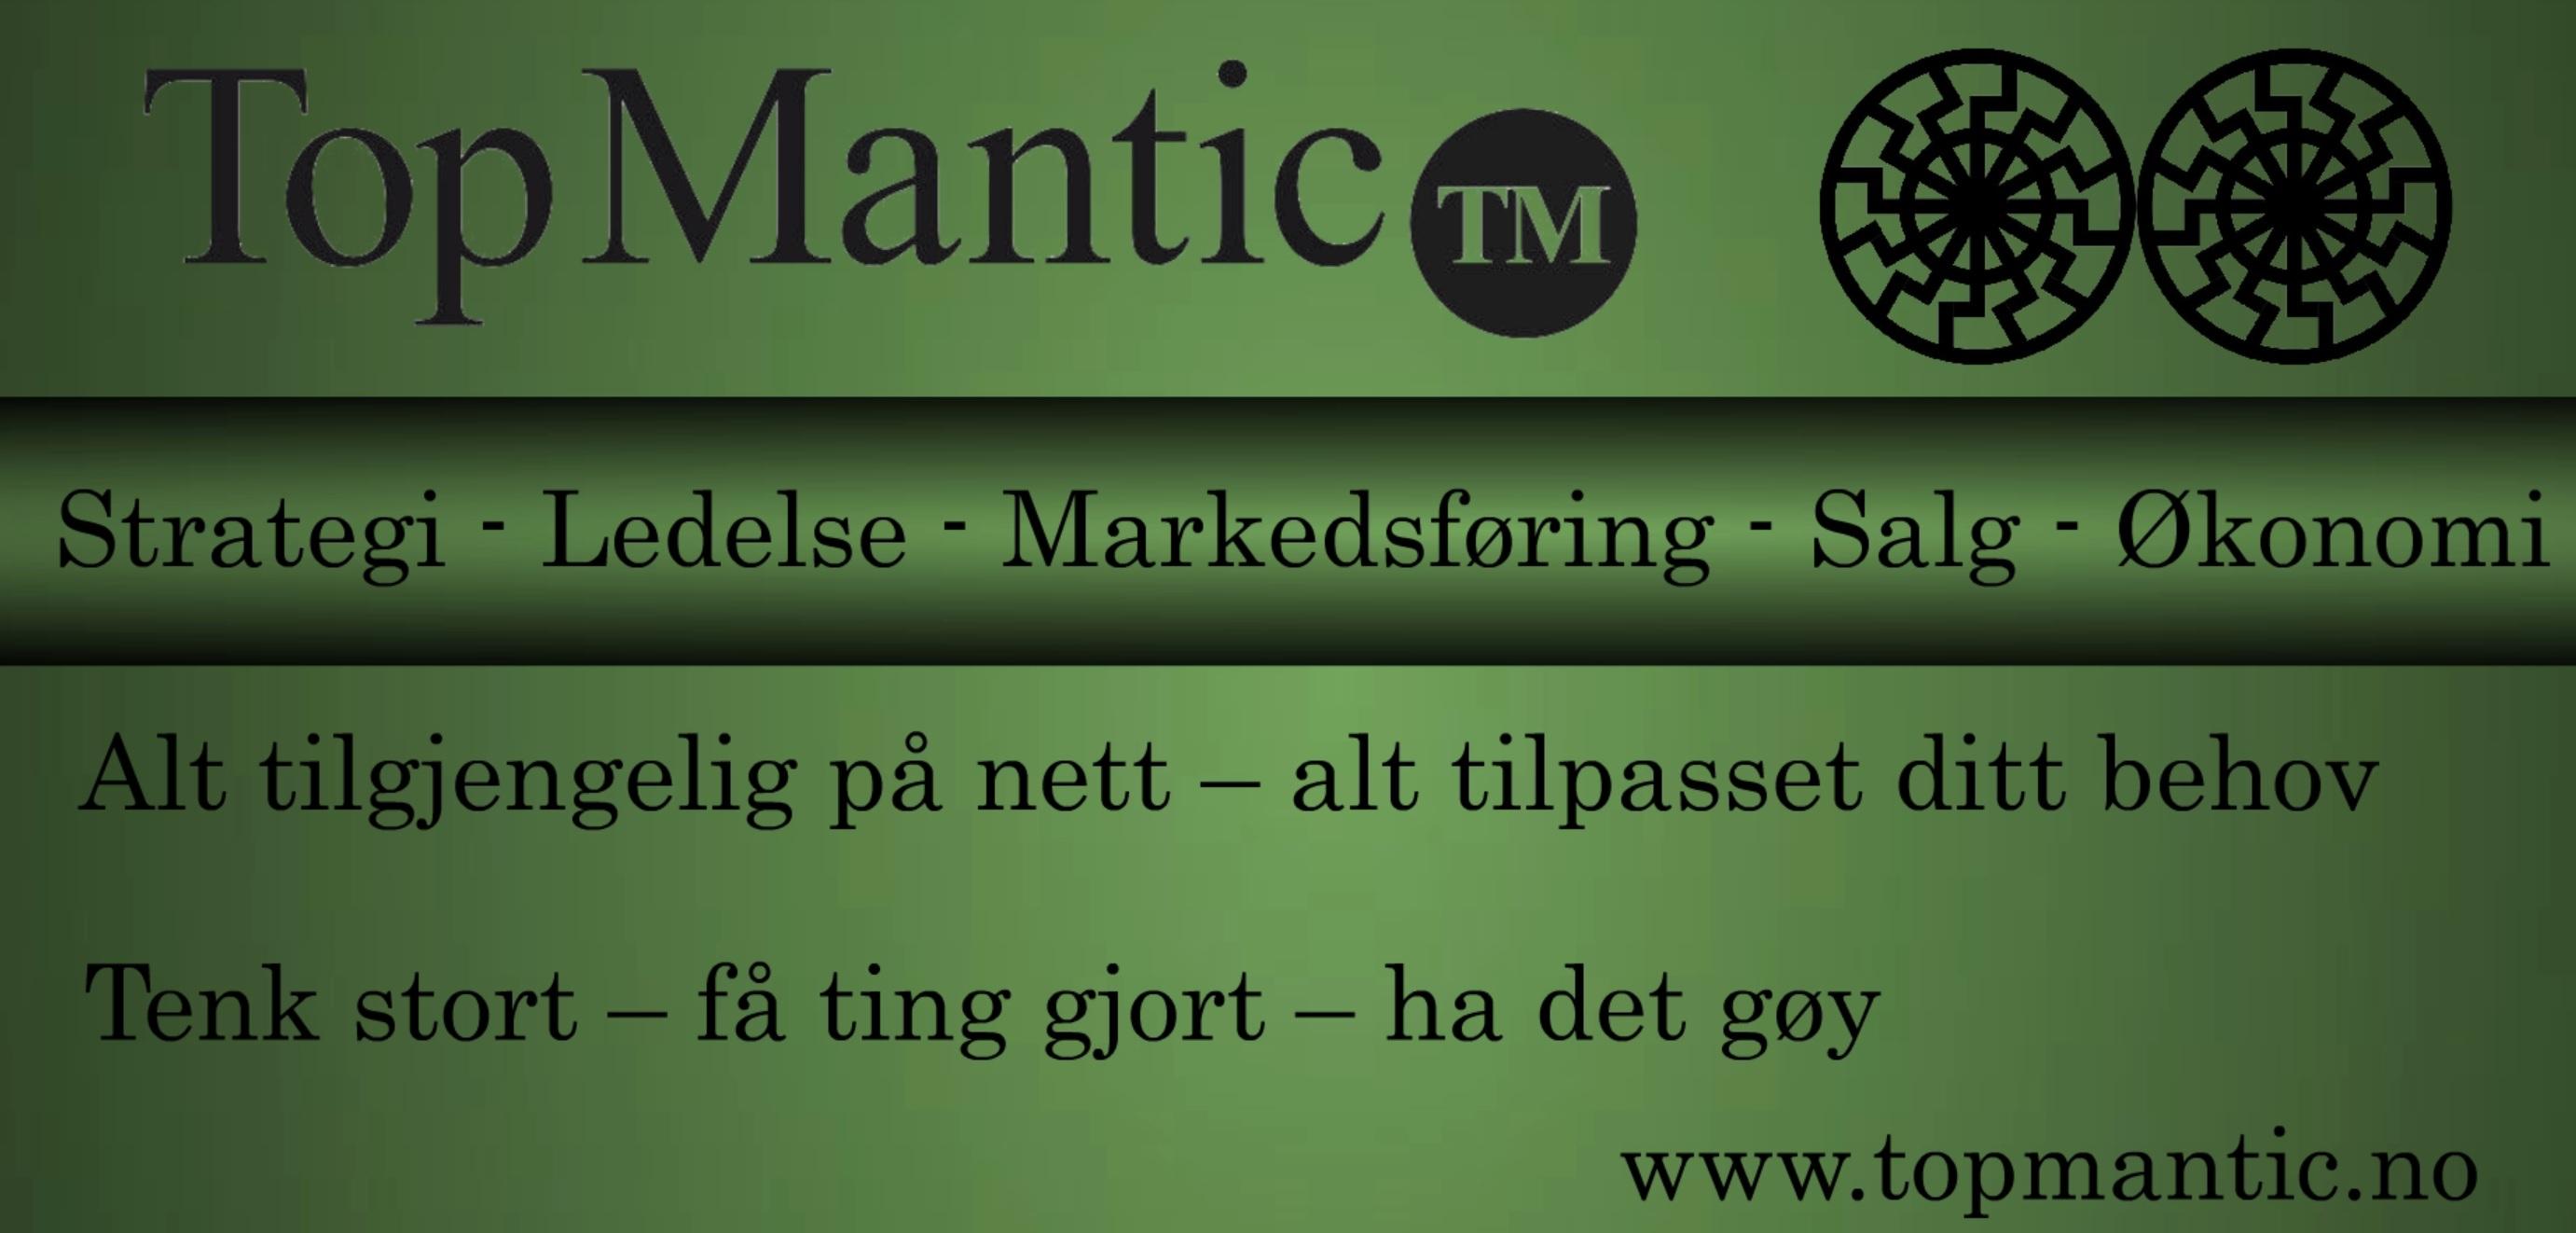 topmantic